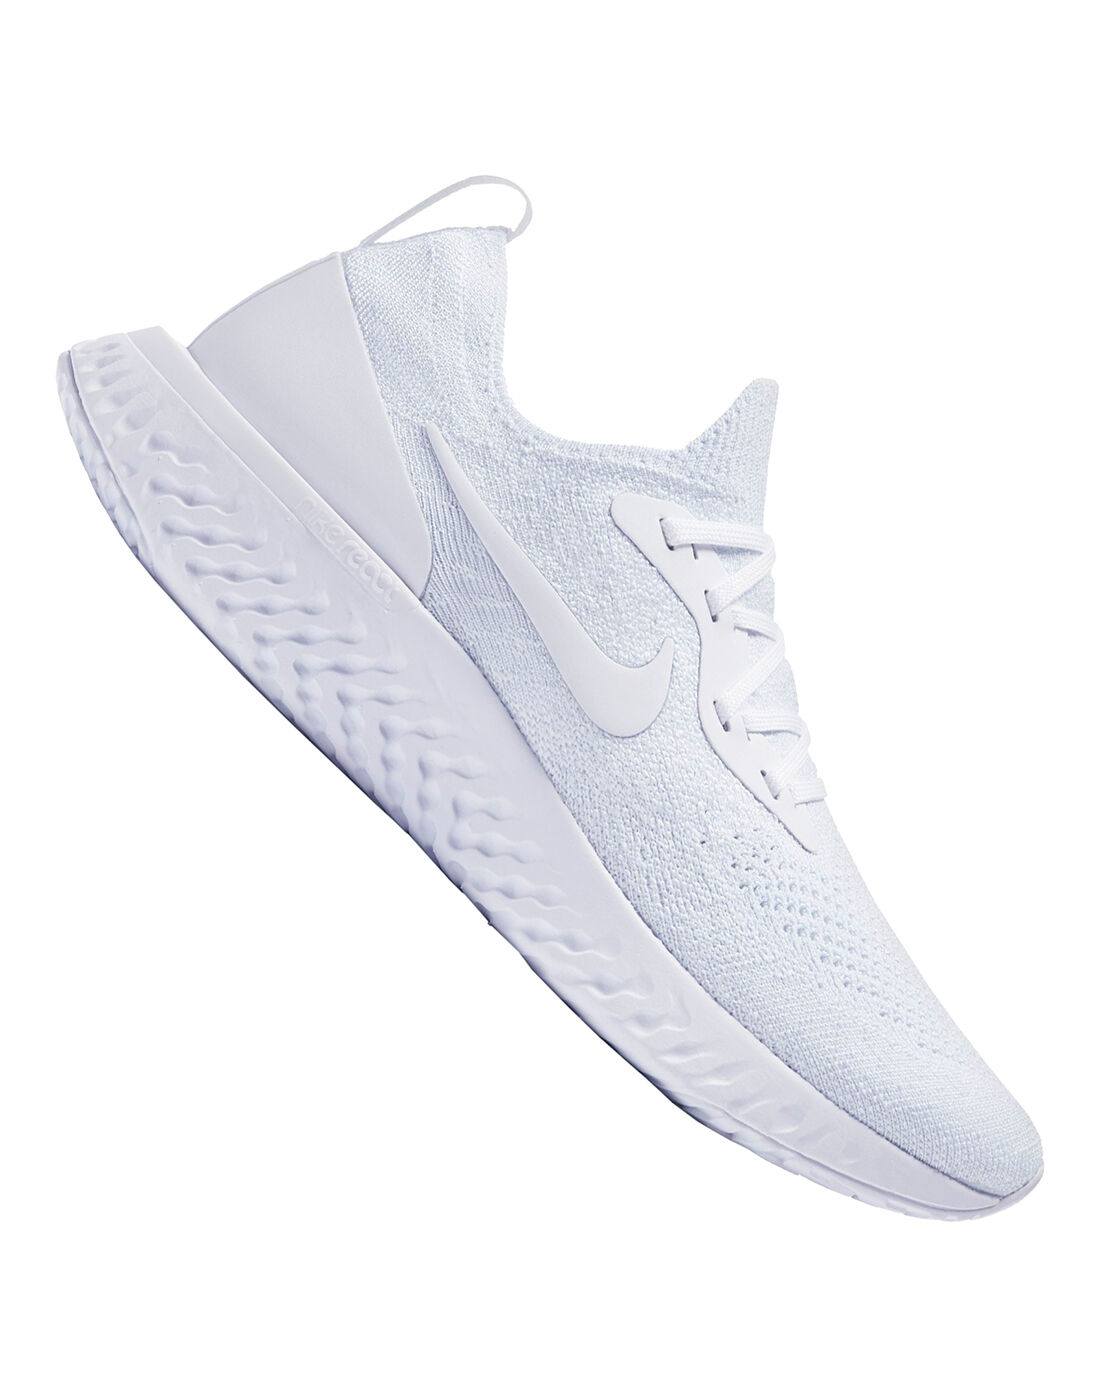 Women's Nike React Flyknit | White